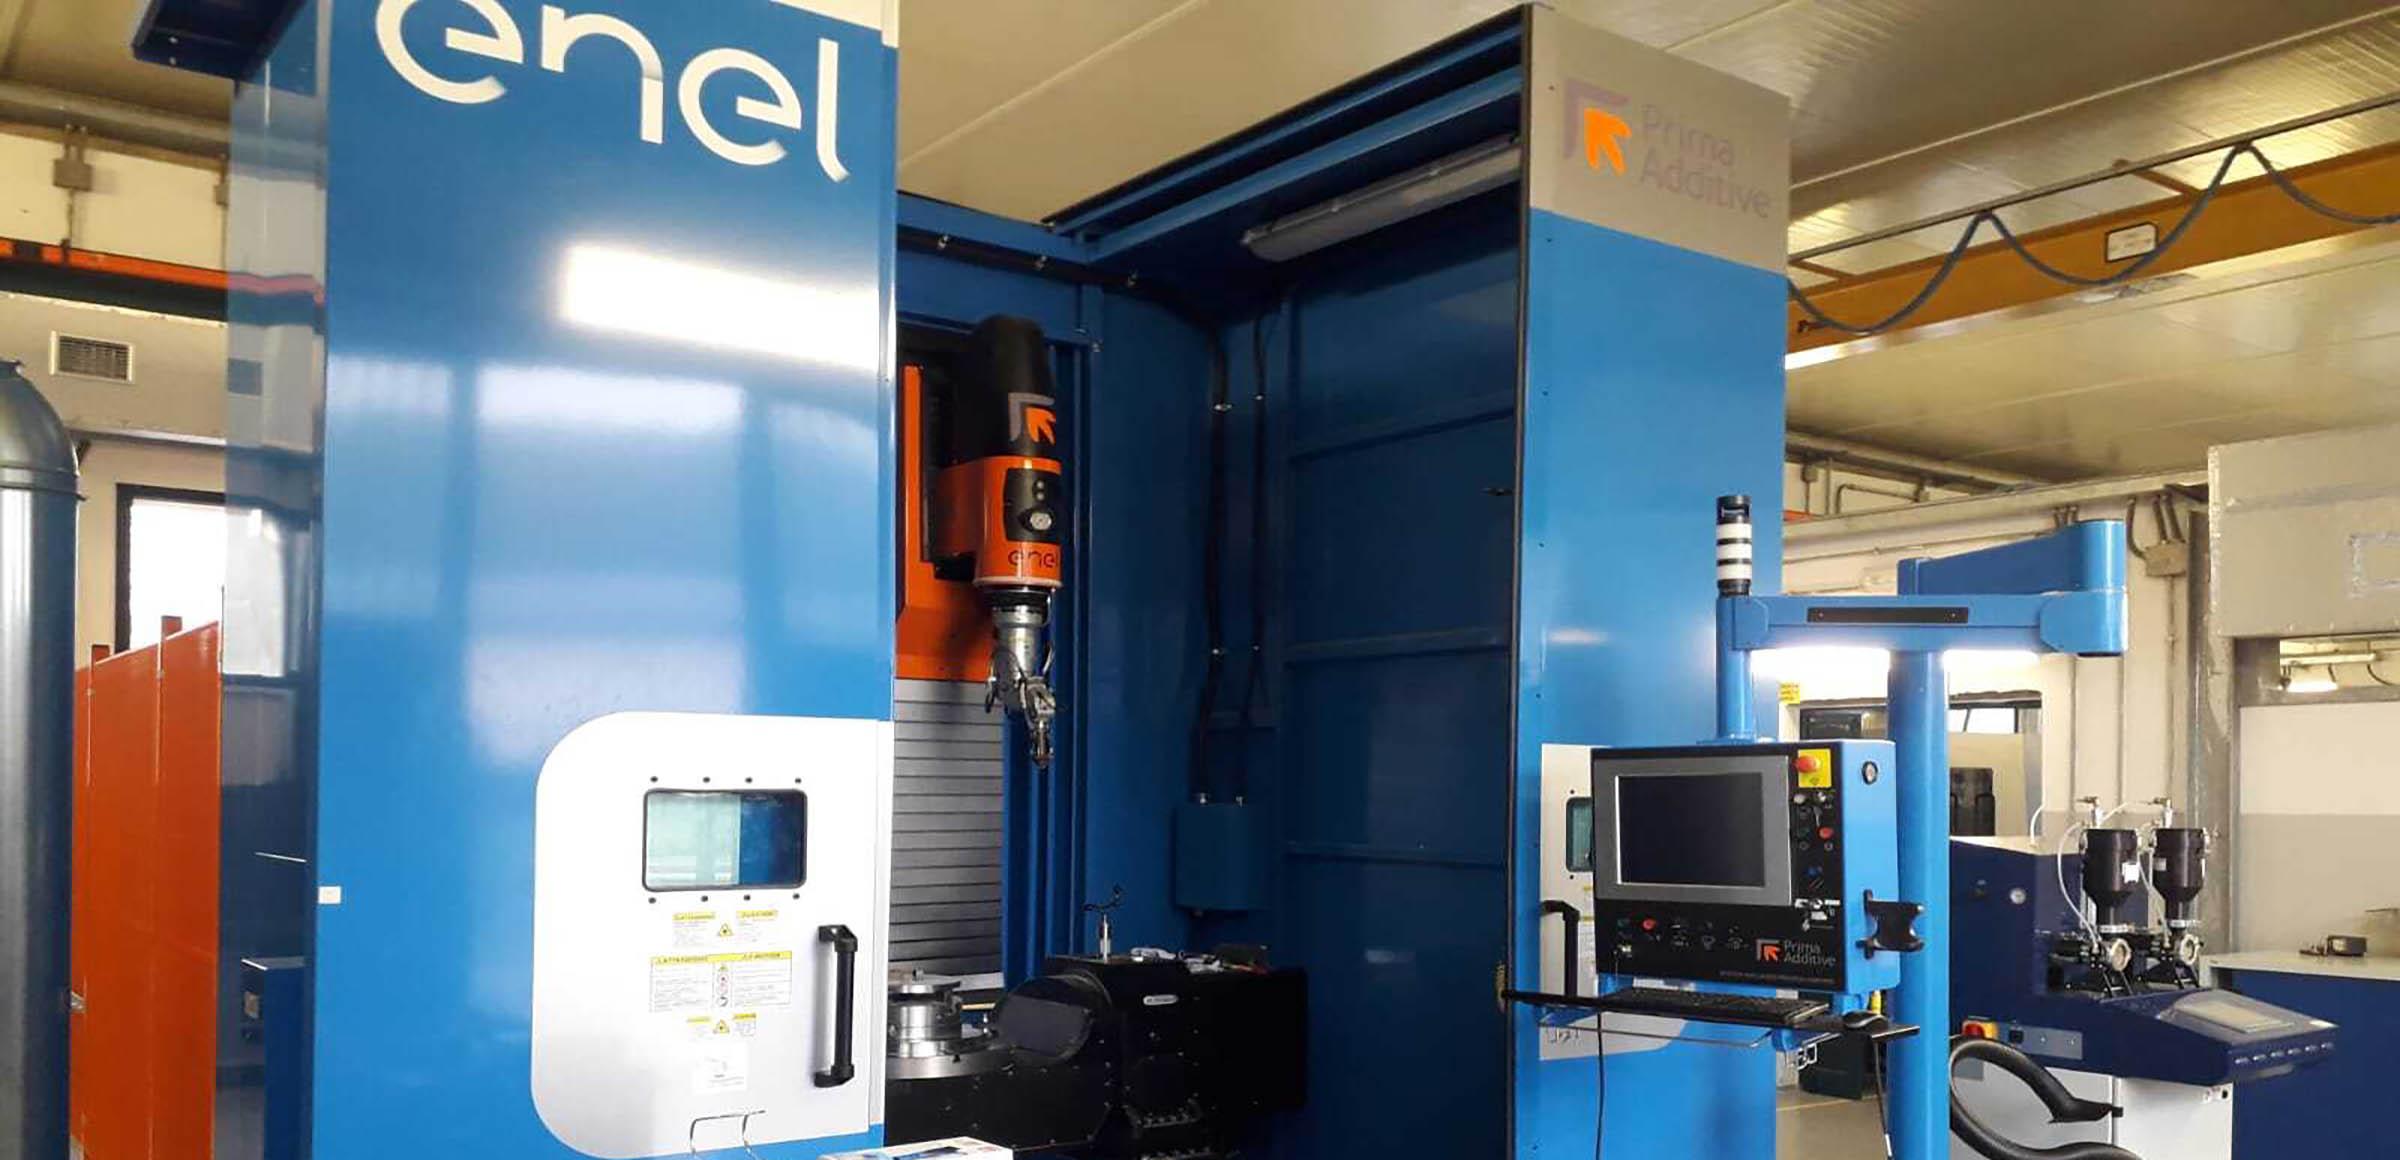 Enel's DED 3D printer housed at the Santa Barbara metallurgy lab. Photo via Enel Green Power.